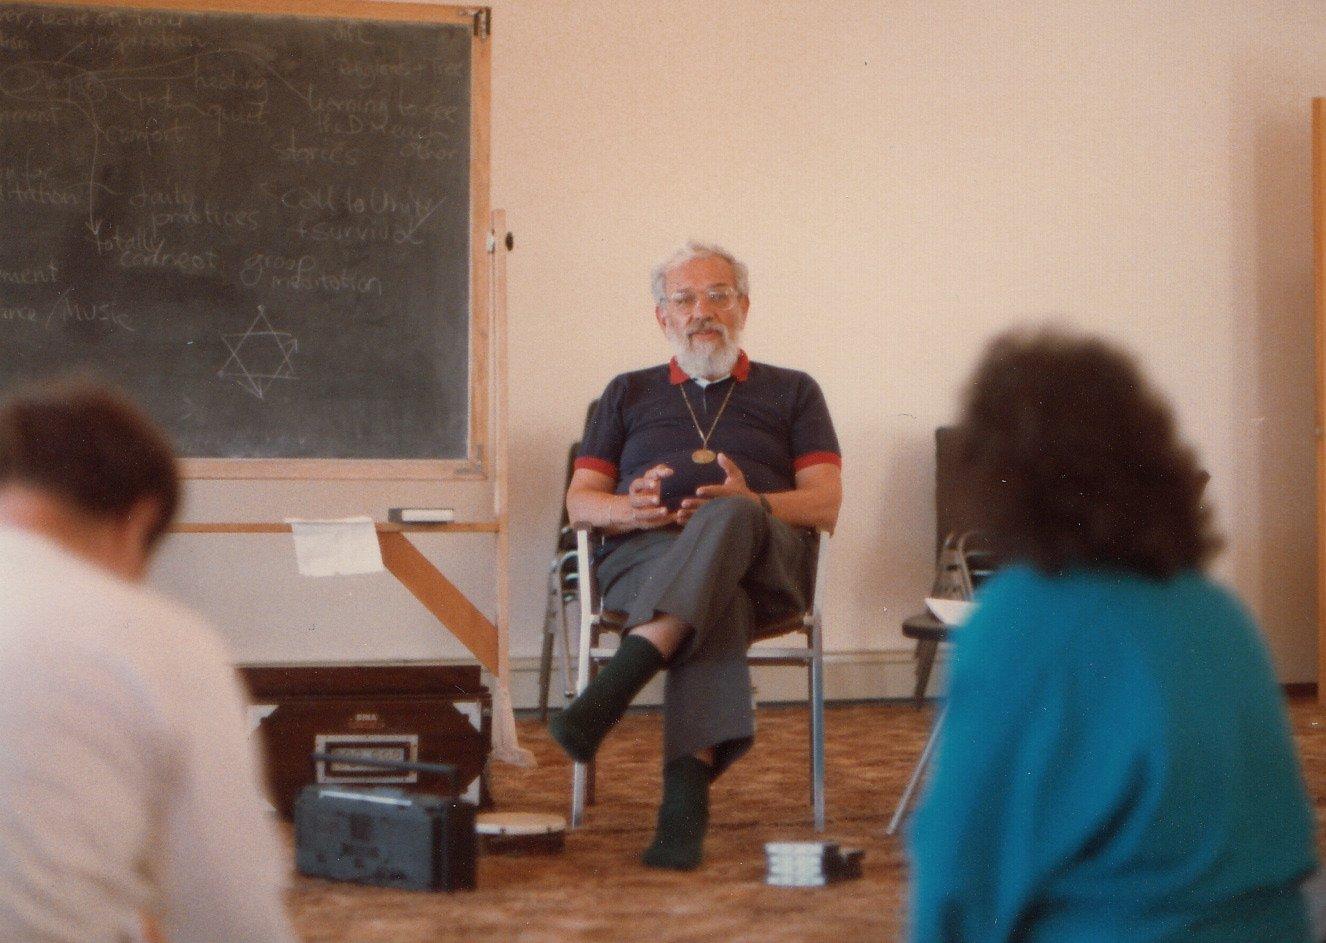 Rabbi Zalman Schachter-Shalomi teaching, 1987.